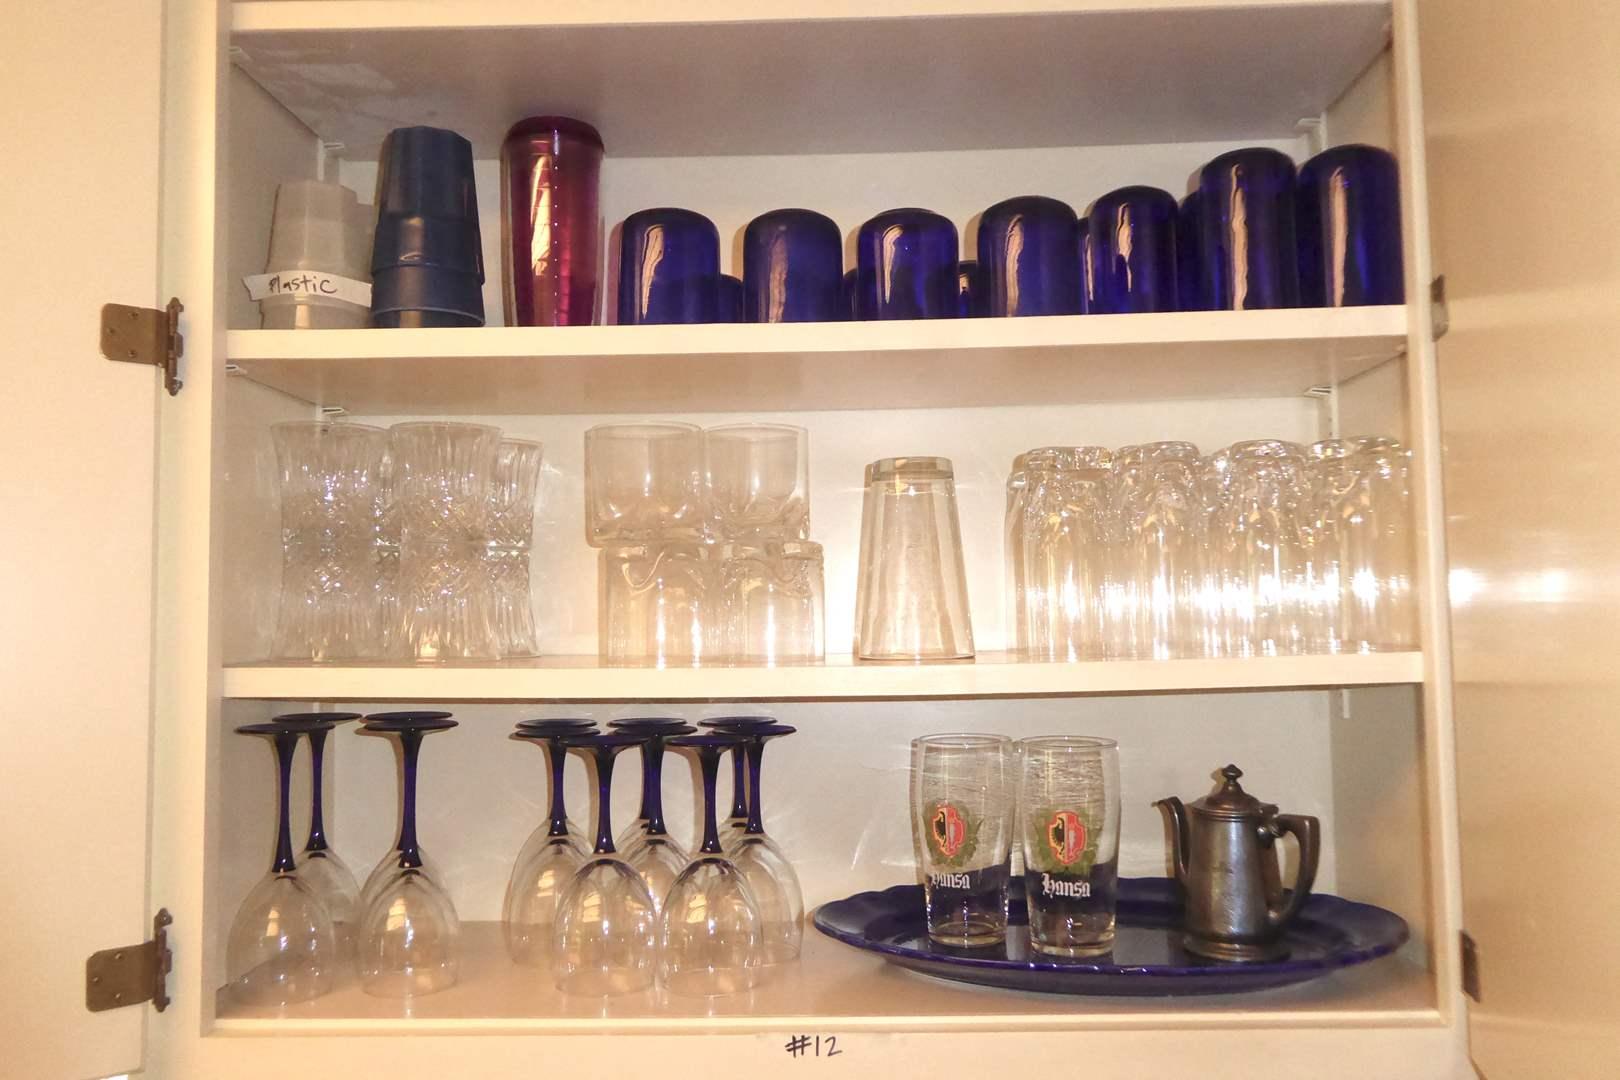 Lot # 12 - Small San Jose Hospital Tea Pot, Pretty Blue Glasses, Clear Glasses & Stemware (main image)